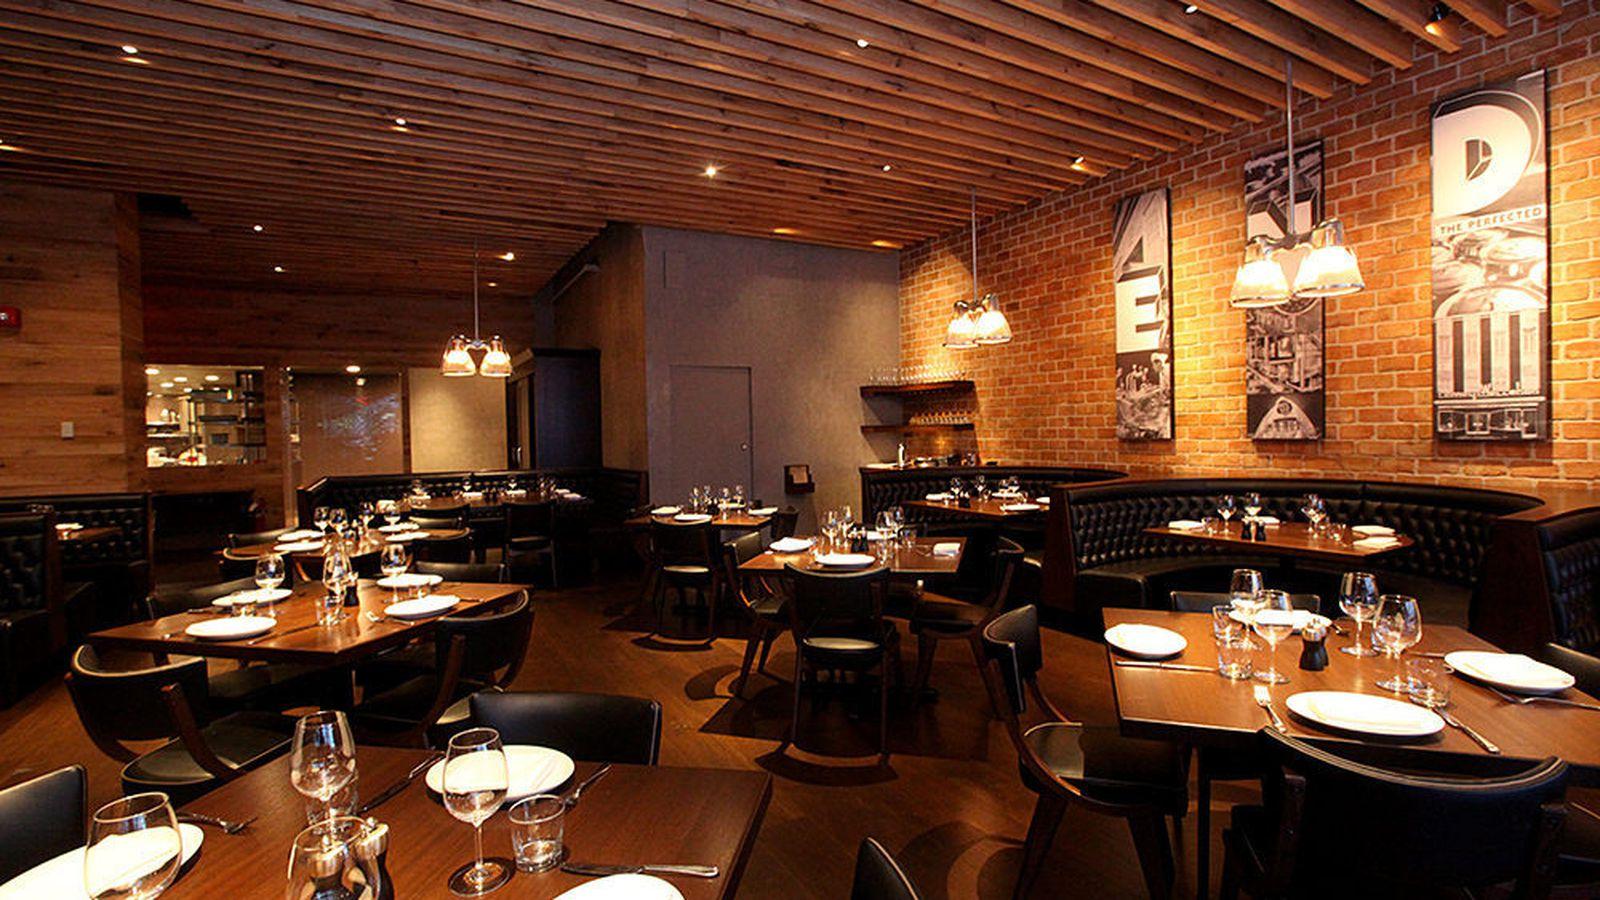 american restaurants - photo #31